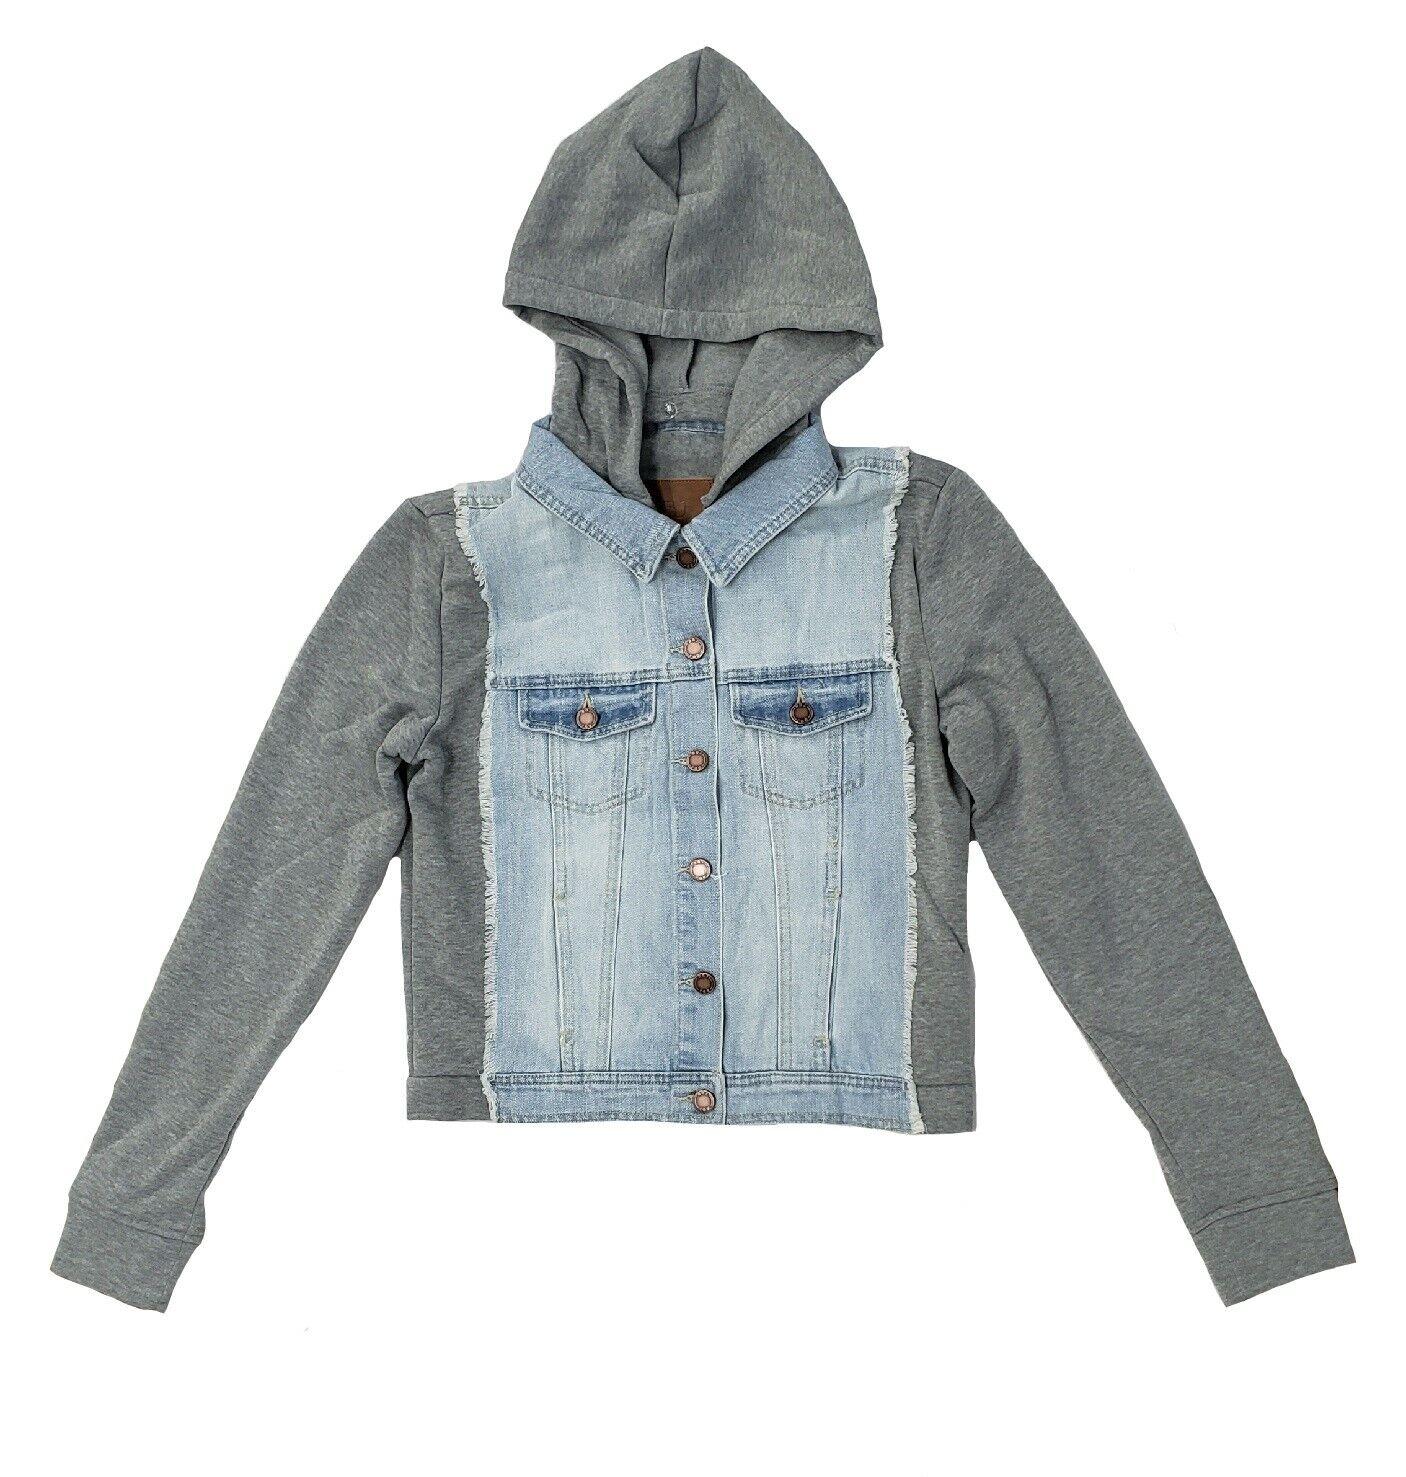 Boom Boom Jeans Denim Sweatshirt Jacket - JK21384Z